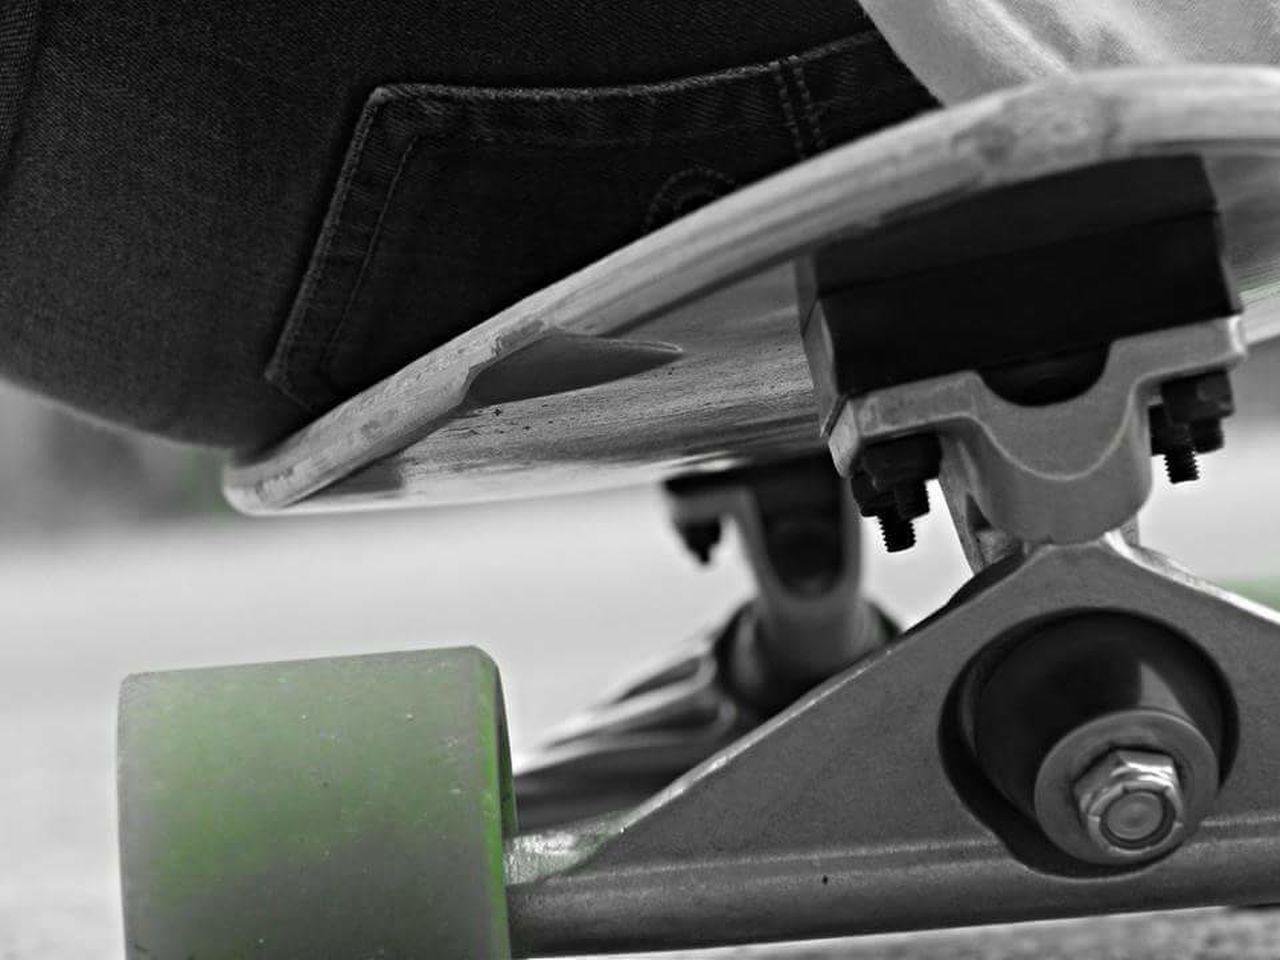 Summertimelaziness Greenwheels Green Filters Ontario Canada Nikon L810 Longboarding Hot Day Lazy Day